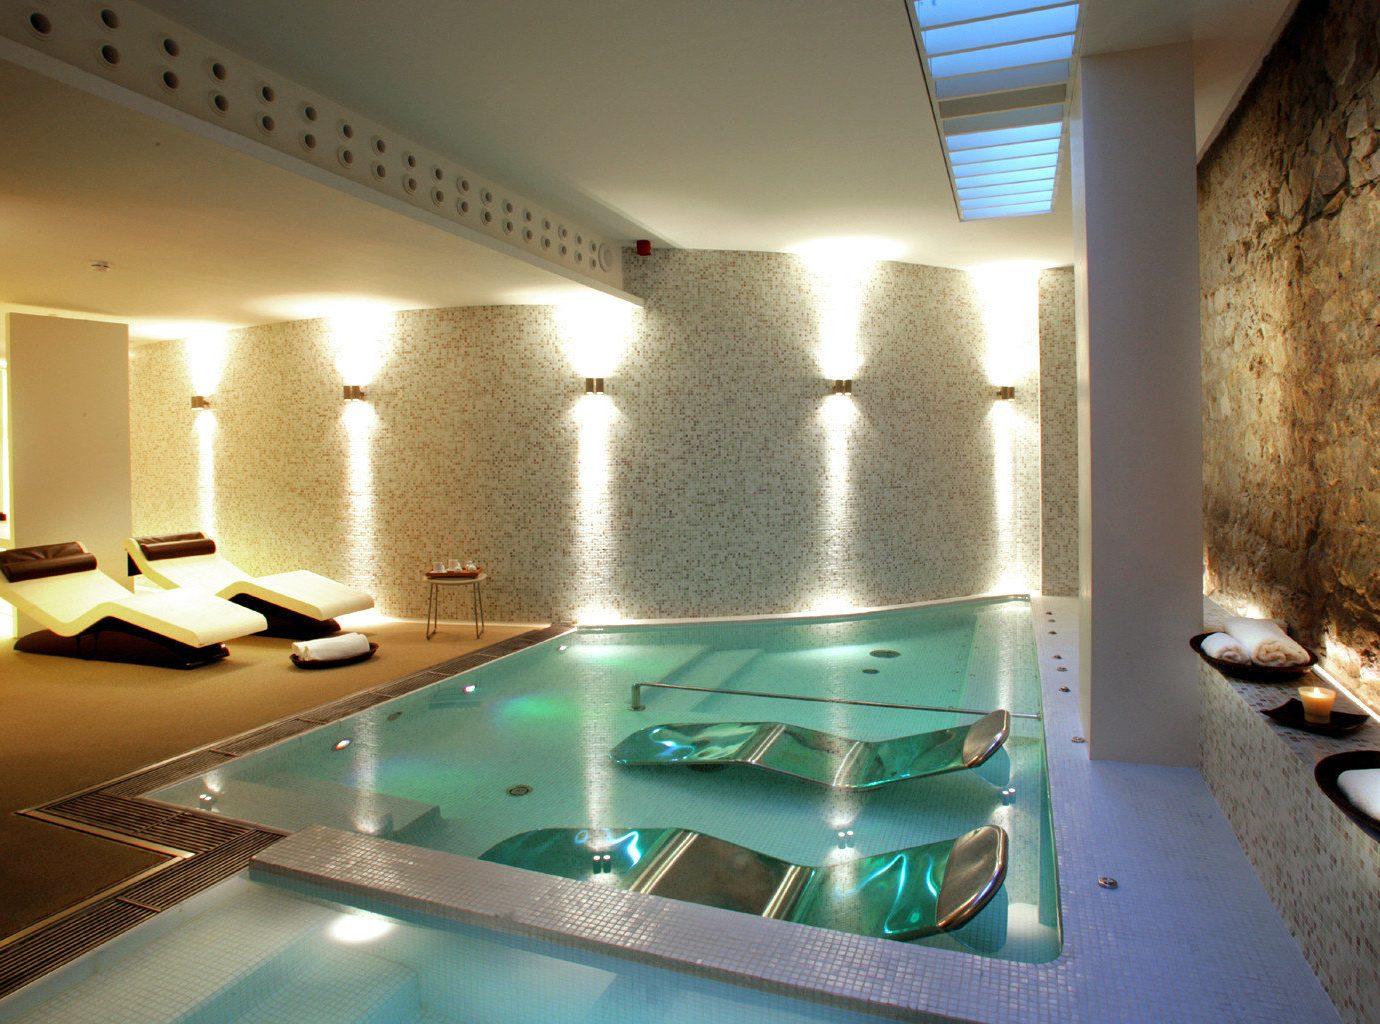 Barcelona Hotels Living Lounge Luxury Modern Pool Spain indoor ceiling wall swimming pool property room estate jacuzzi floor interior design